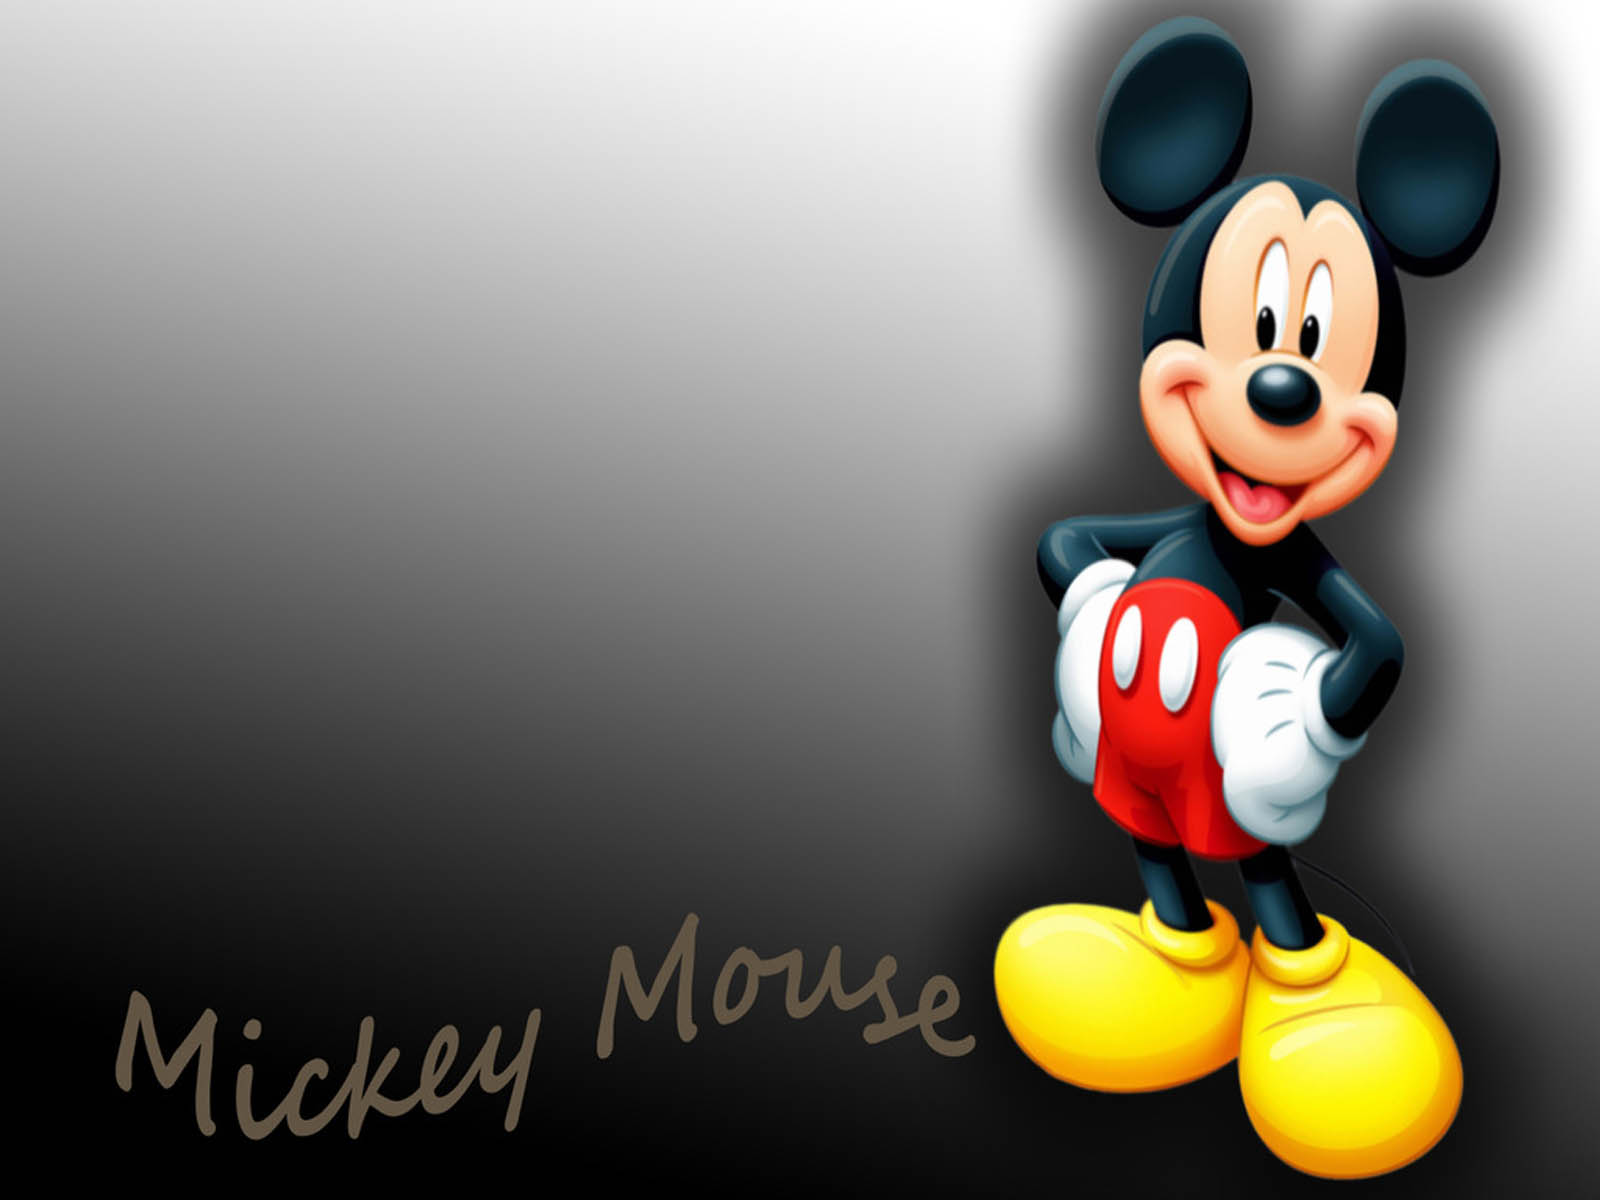 50 ] Free Mickey Mouse Wallpaper On WallpaperSafari